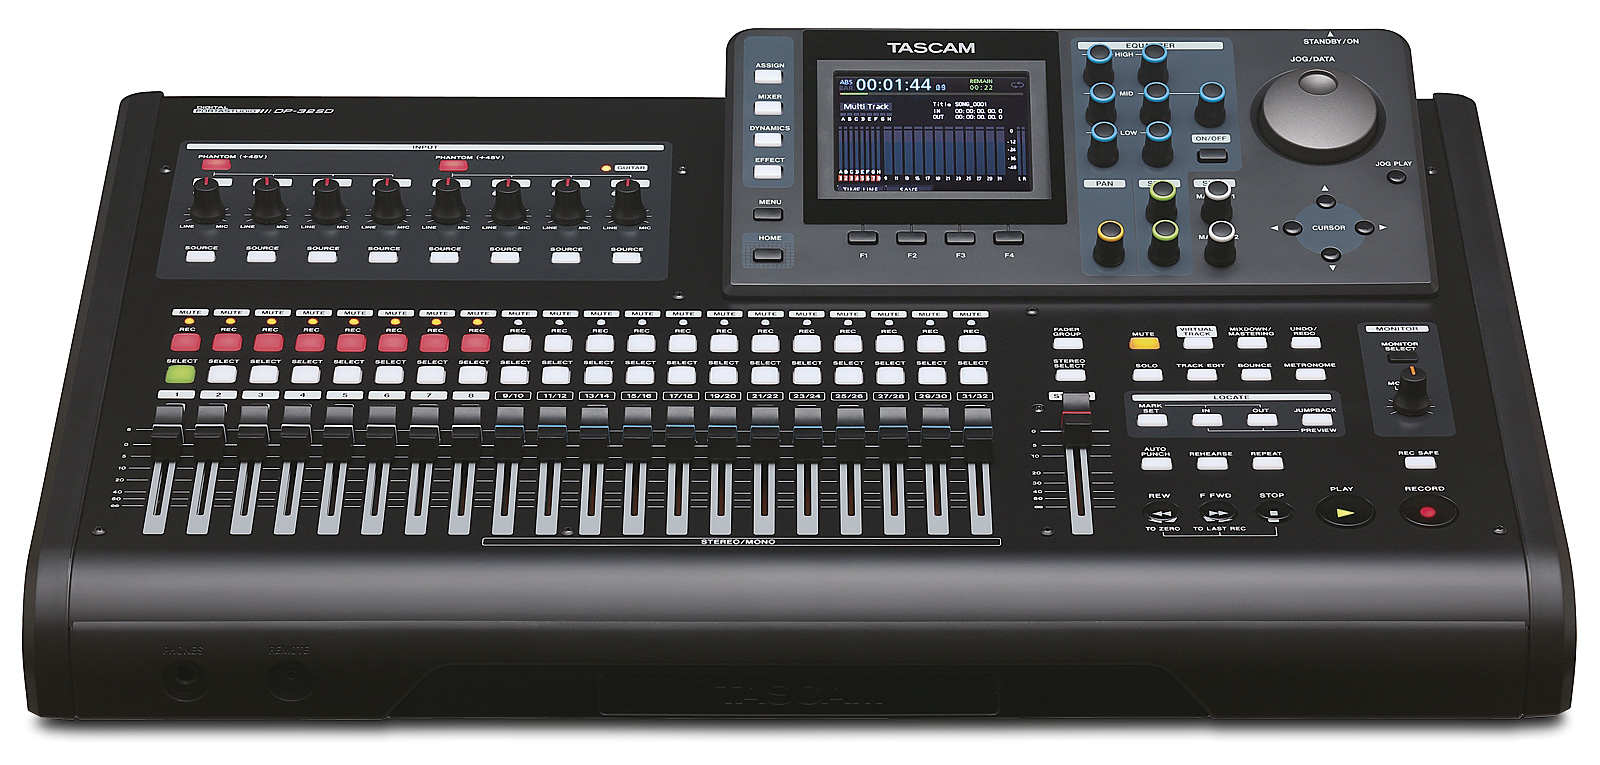 Tascam DP-32SD Digital 32 track recorder